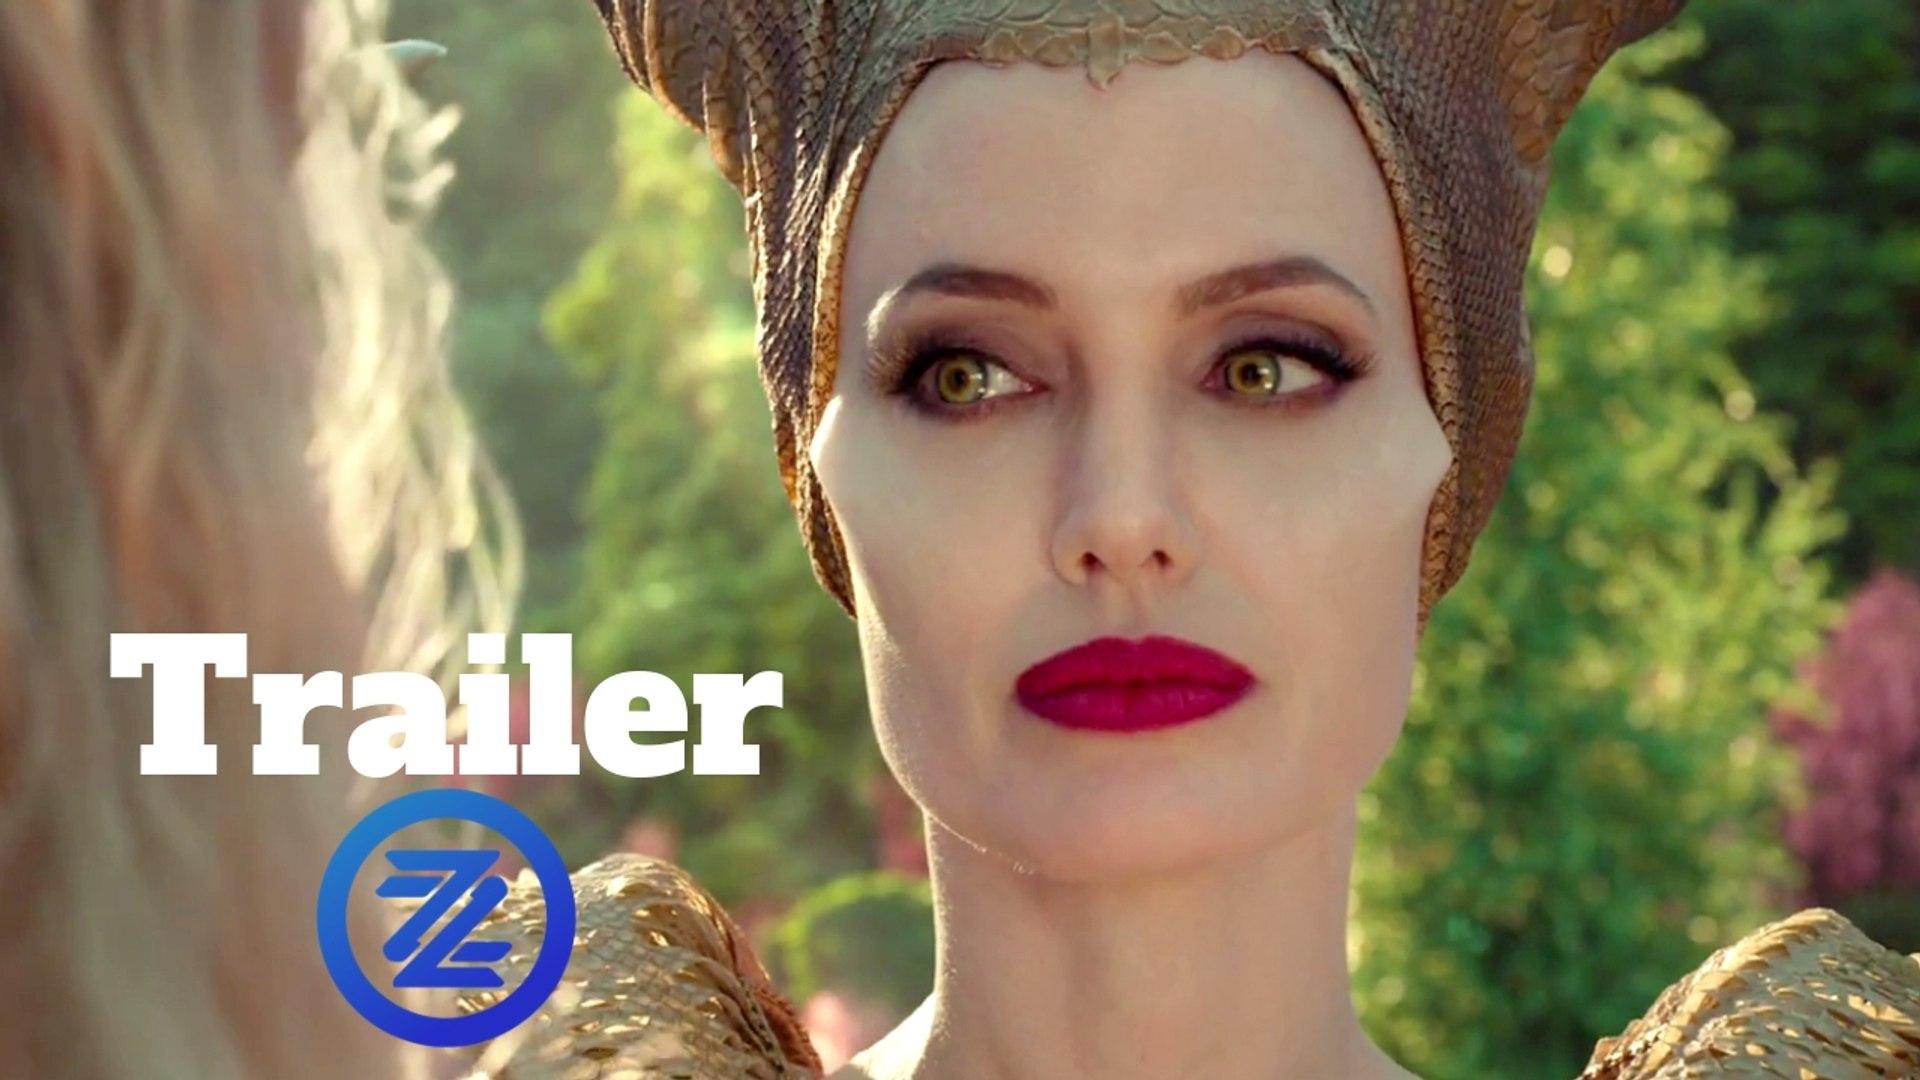 Maleficent Mistress Of Evil Trailer 1 2019 Angelina Jolie Elle Fanning Adventure Movie Hd